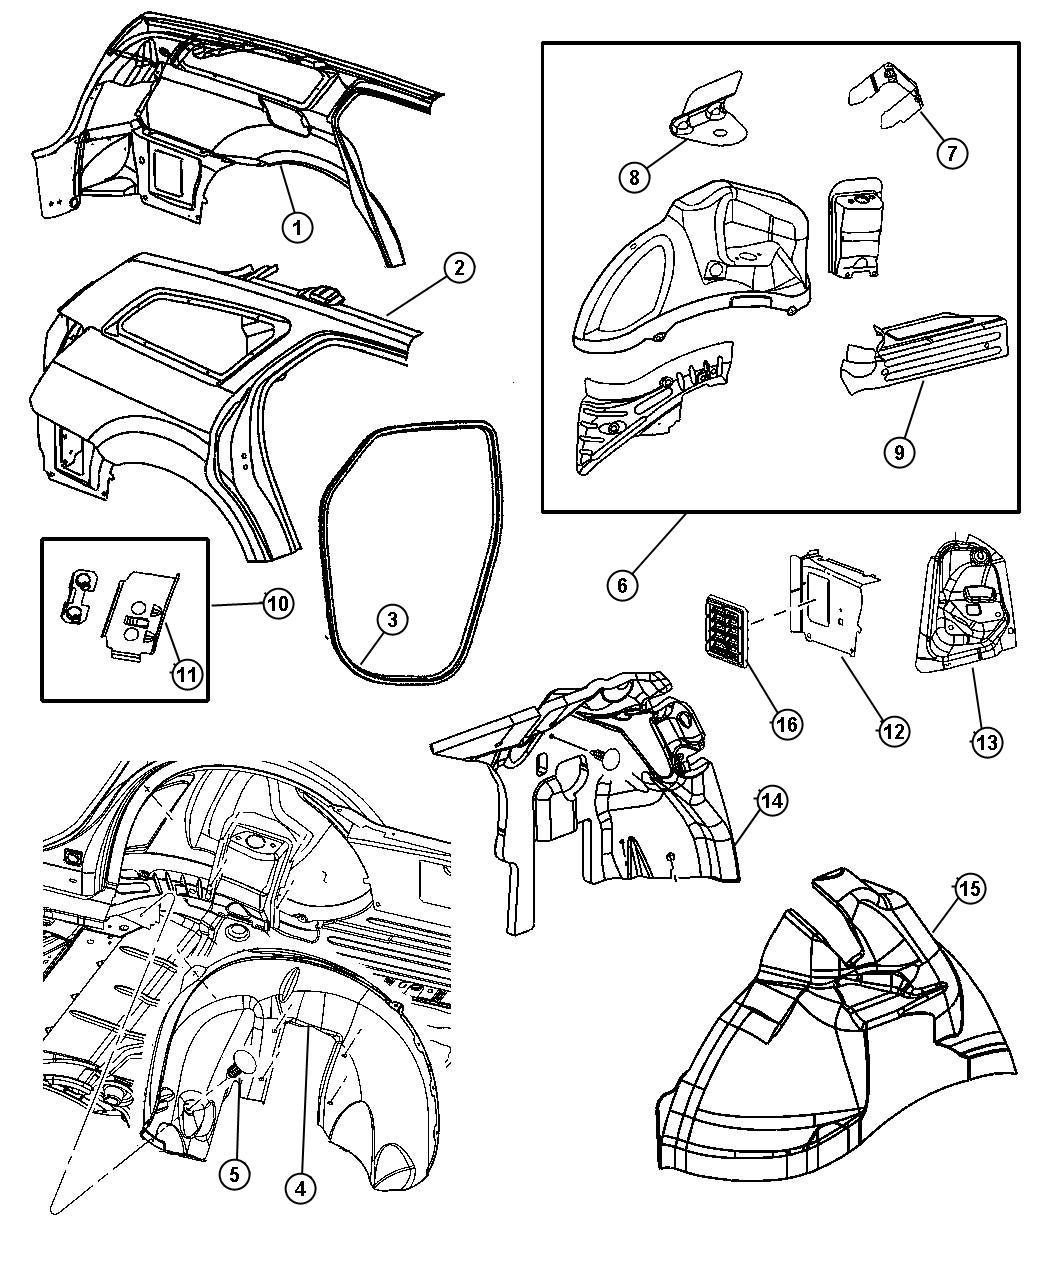 Dodge Charger Panel Rear Wheelhouse Right